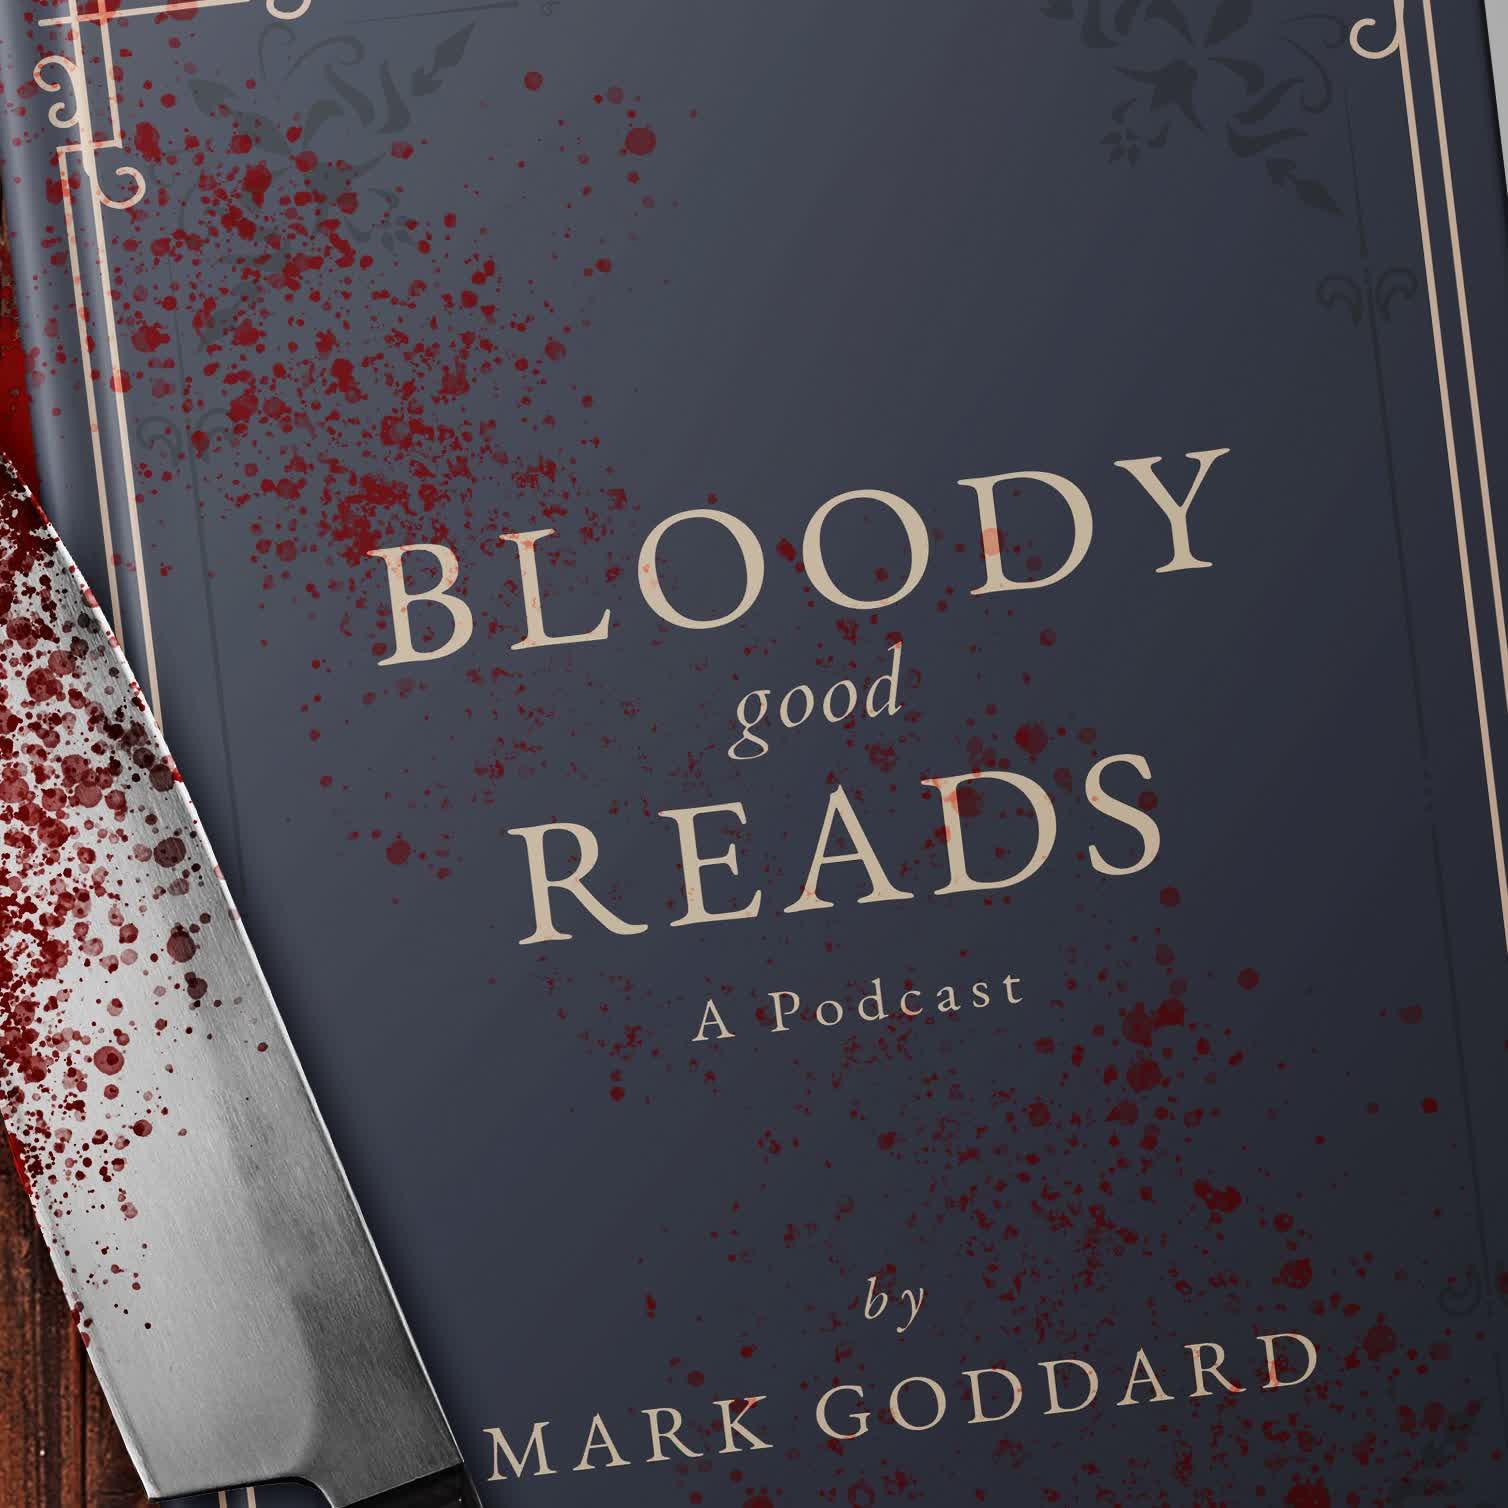 Bloody Good Reads Chapter 11 - James Brogden